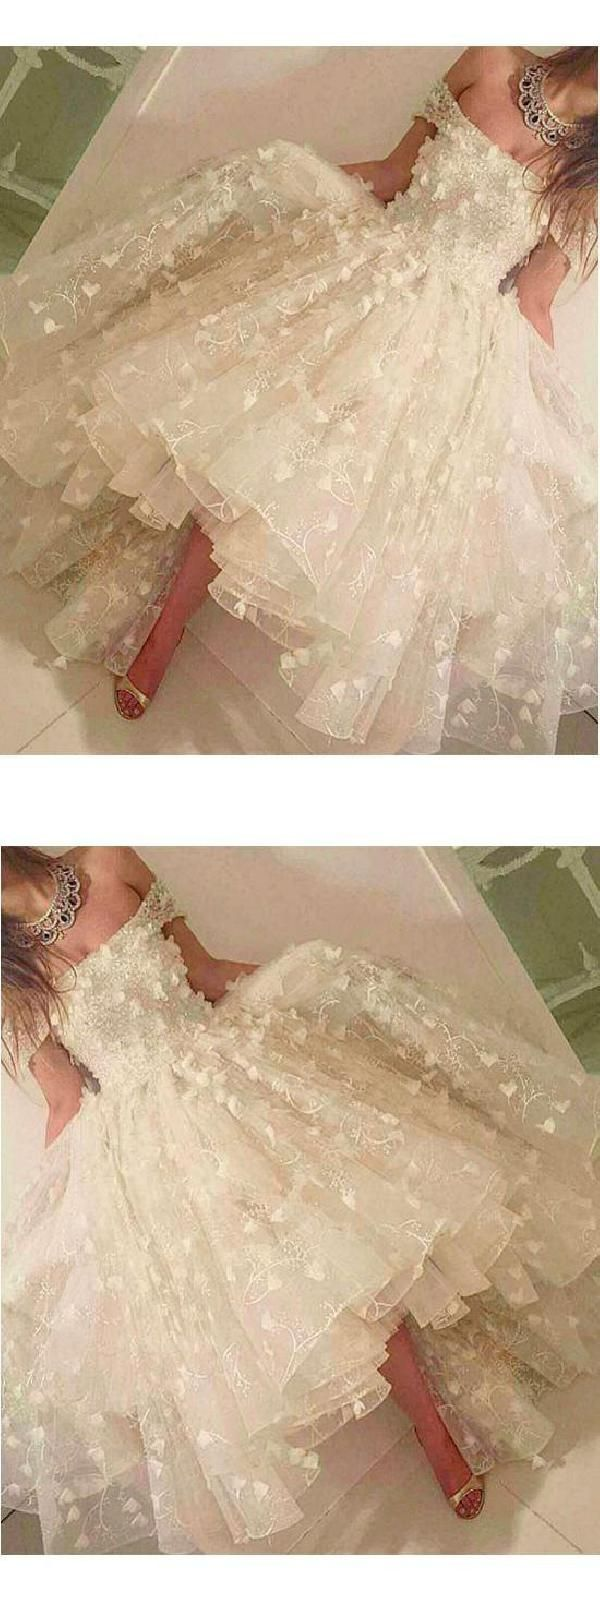 High low prom dresses highlowpromdresses prom dresses white